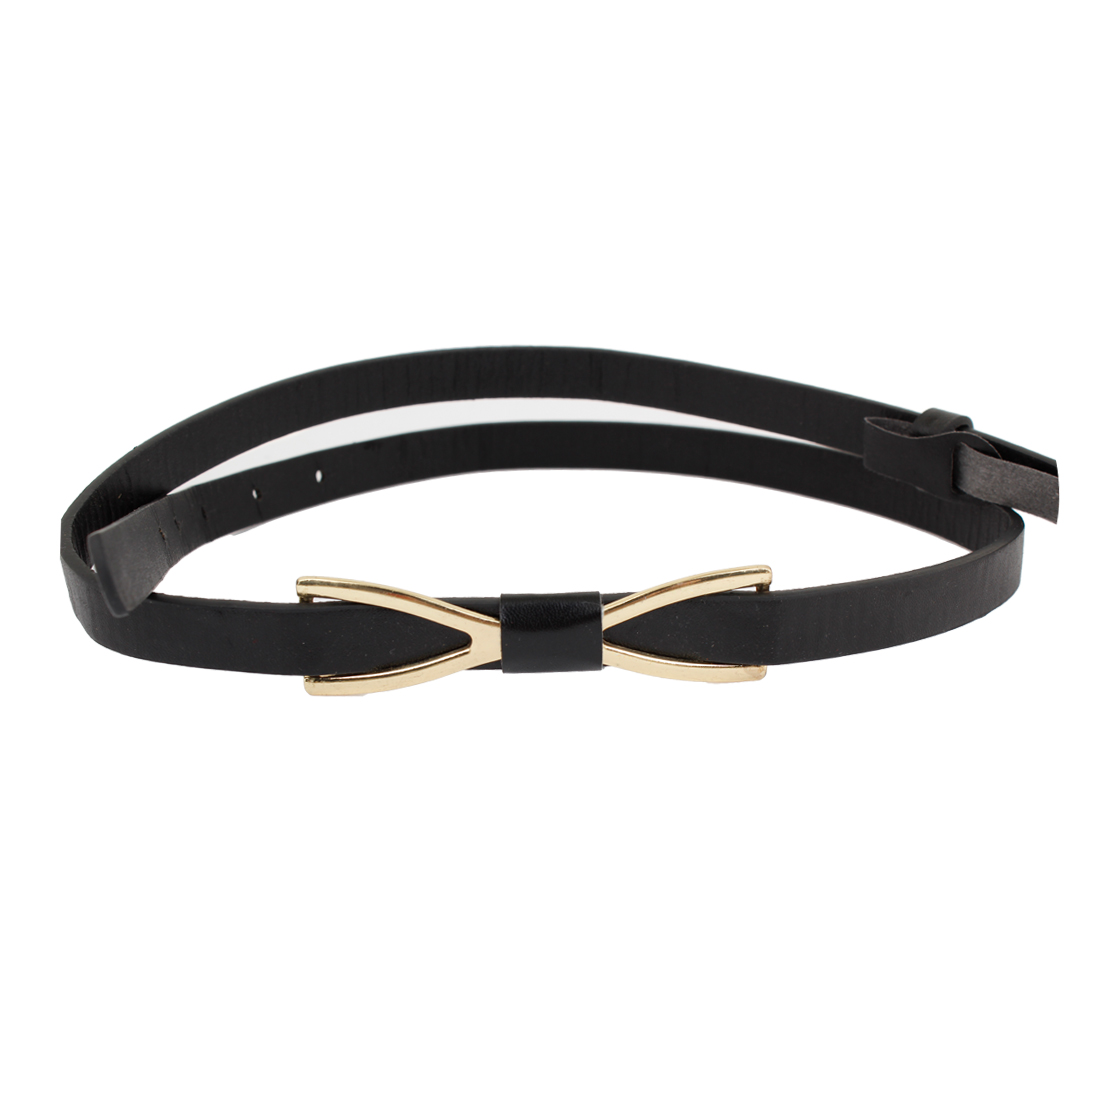 Woman Press Buckle Bowtie Accent Faux Leather Skinny Waist Belt Black